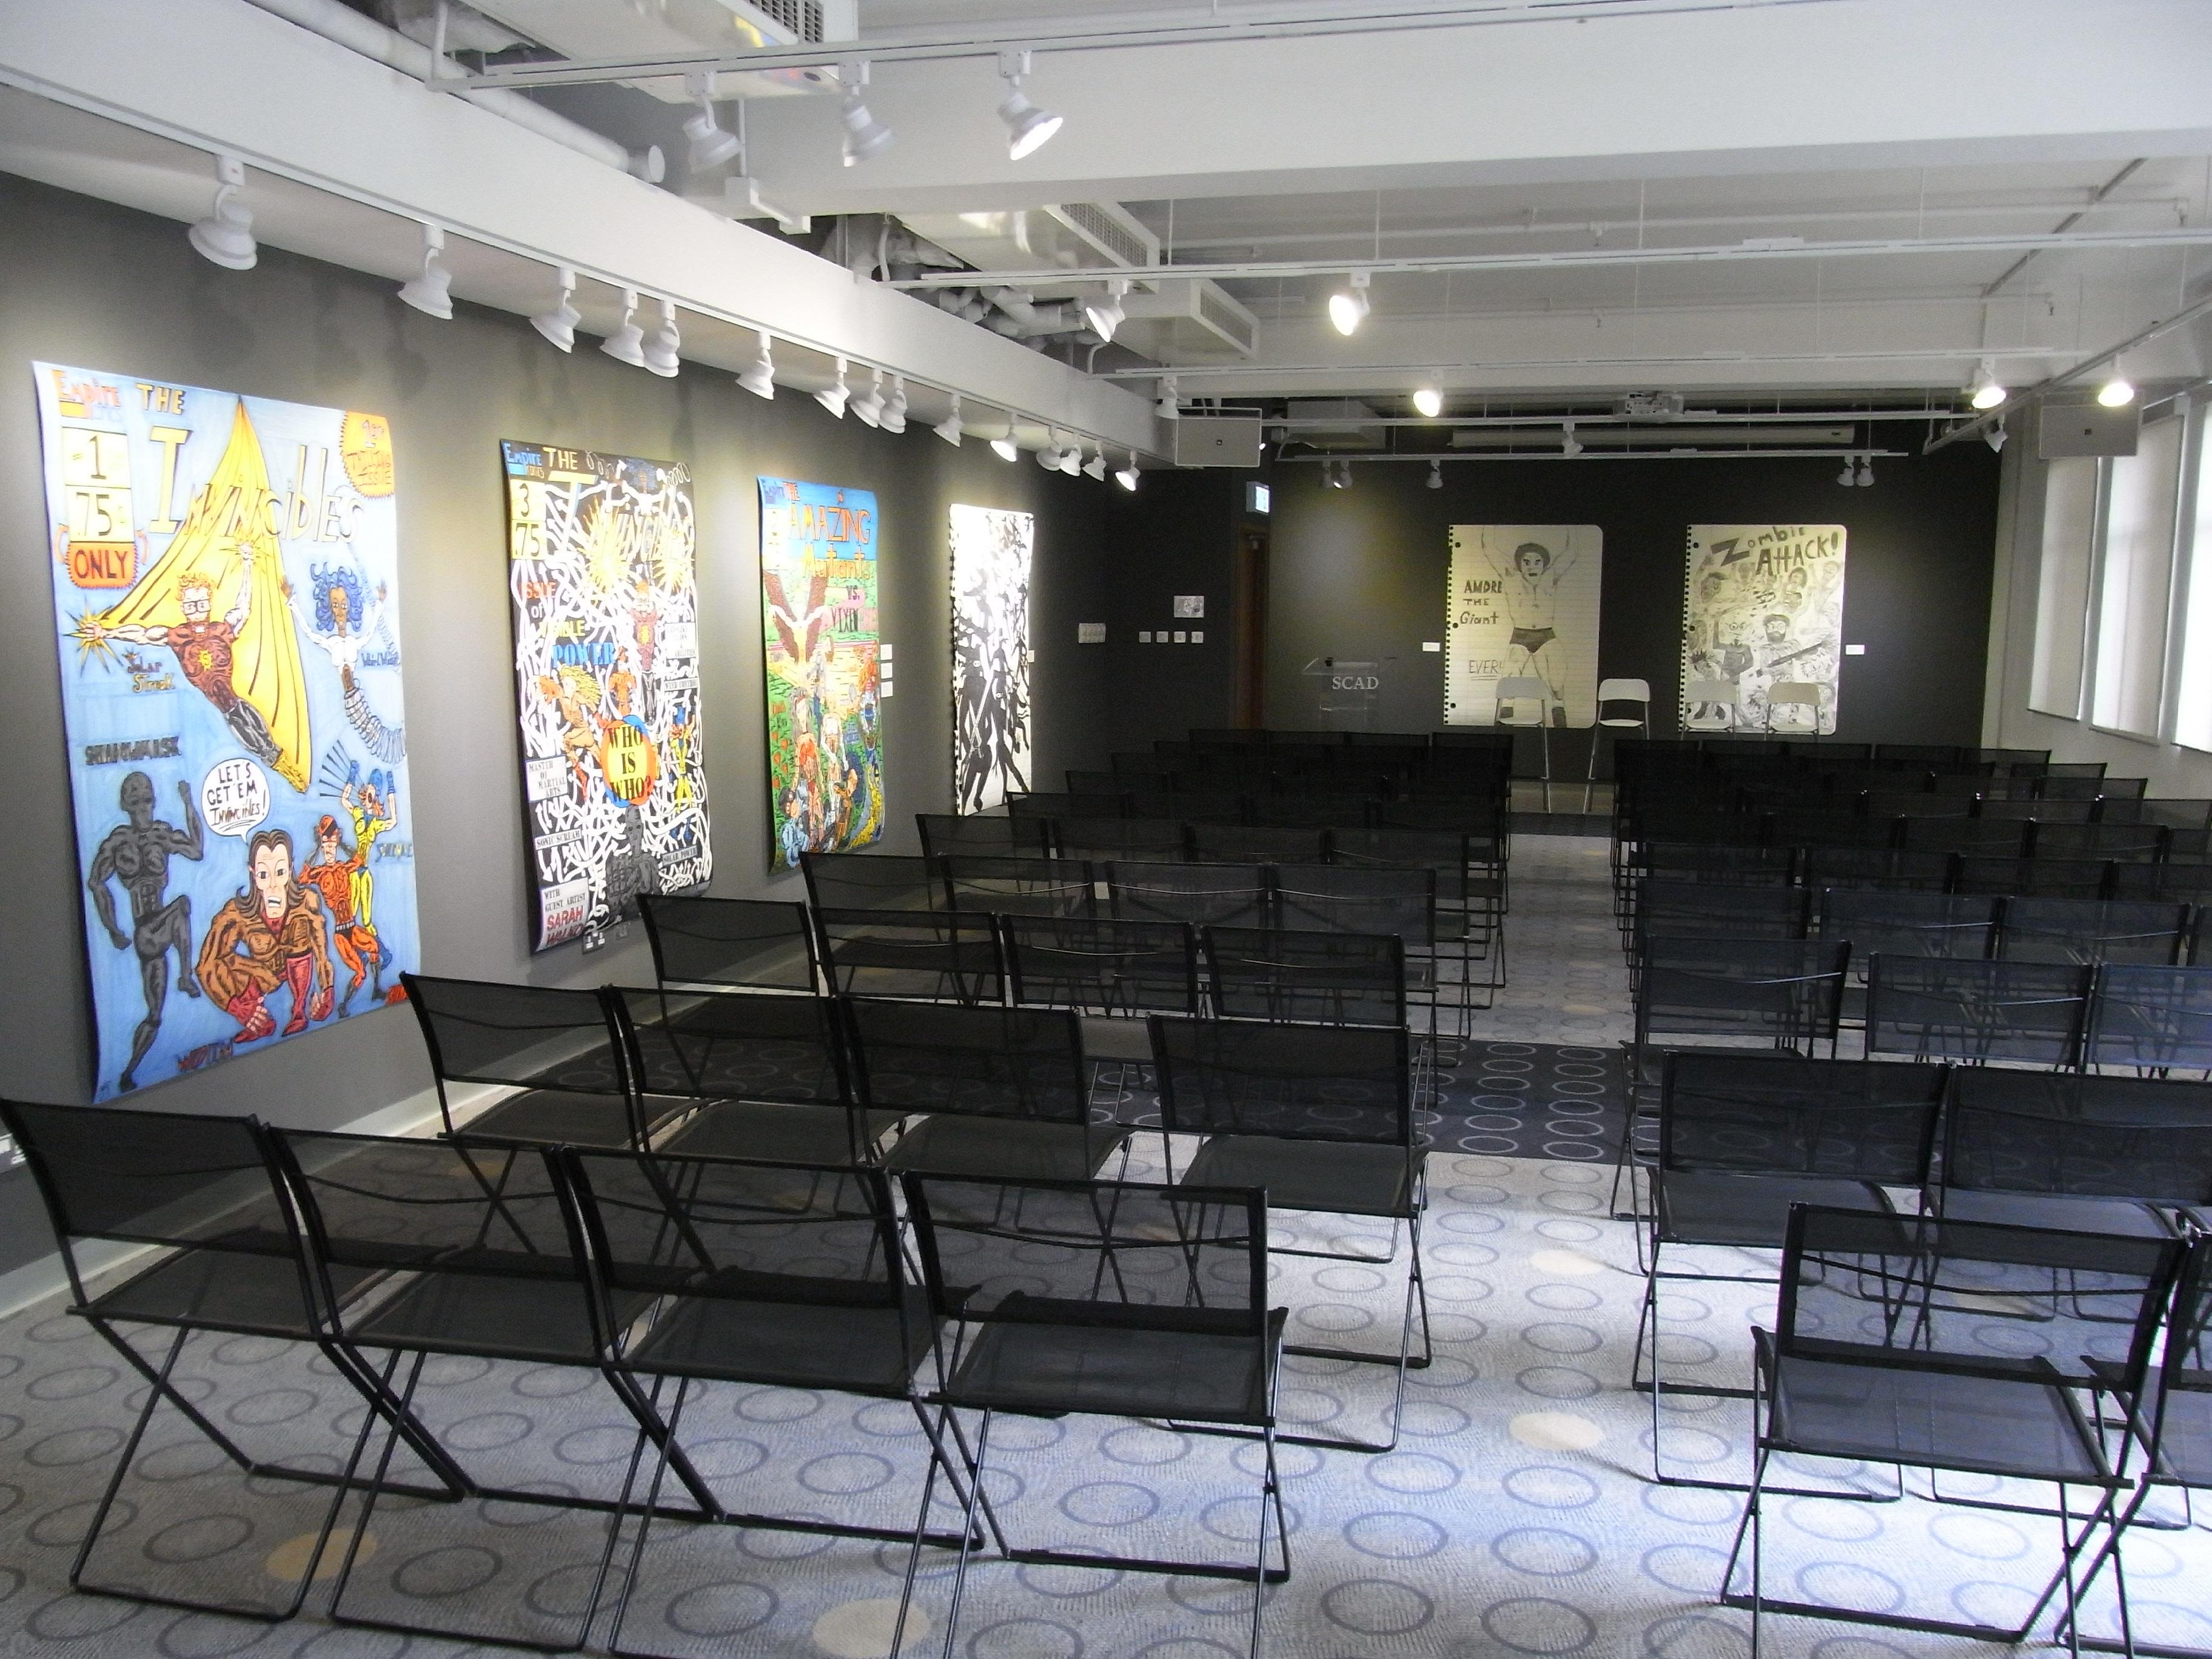 File:HK 292 Tai Po Road 薩凡納藝術設計學院 SCAD Seminar Room